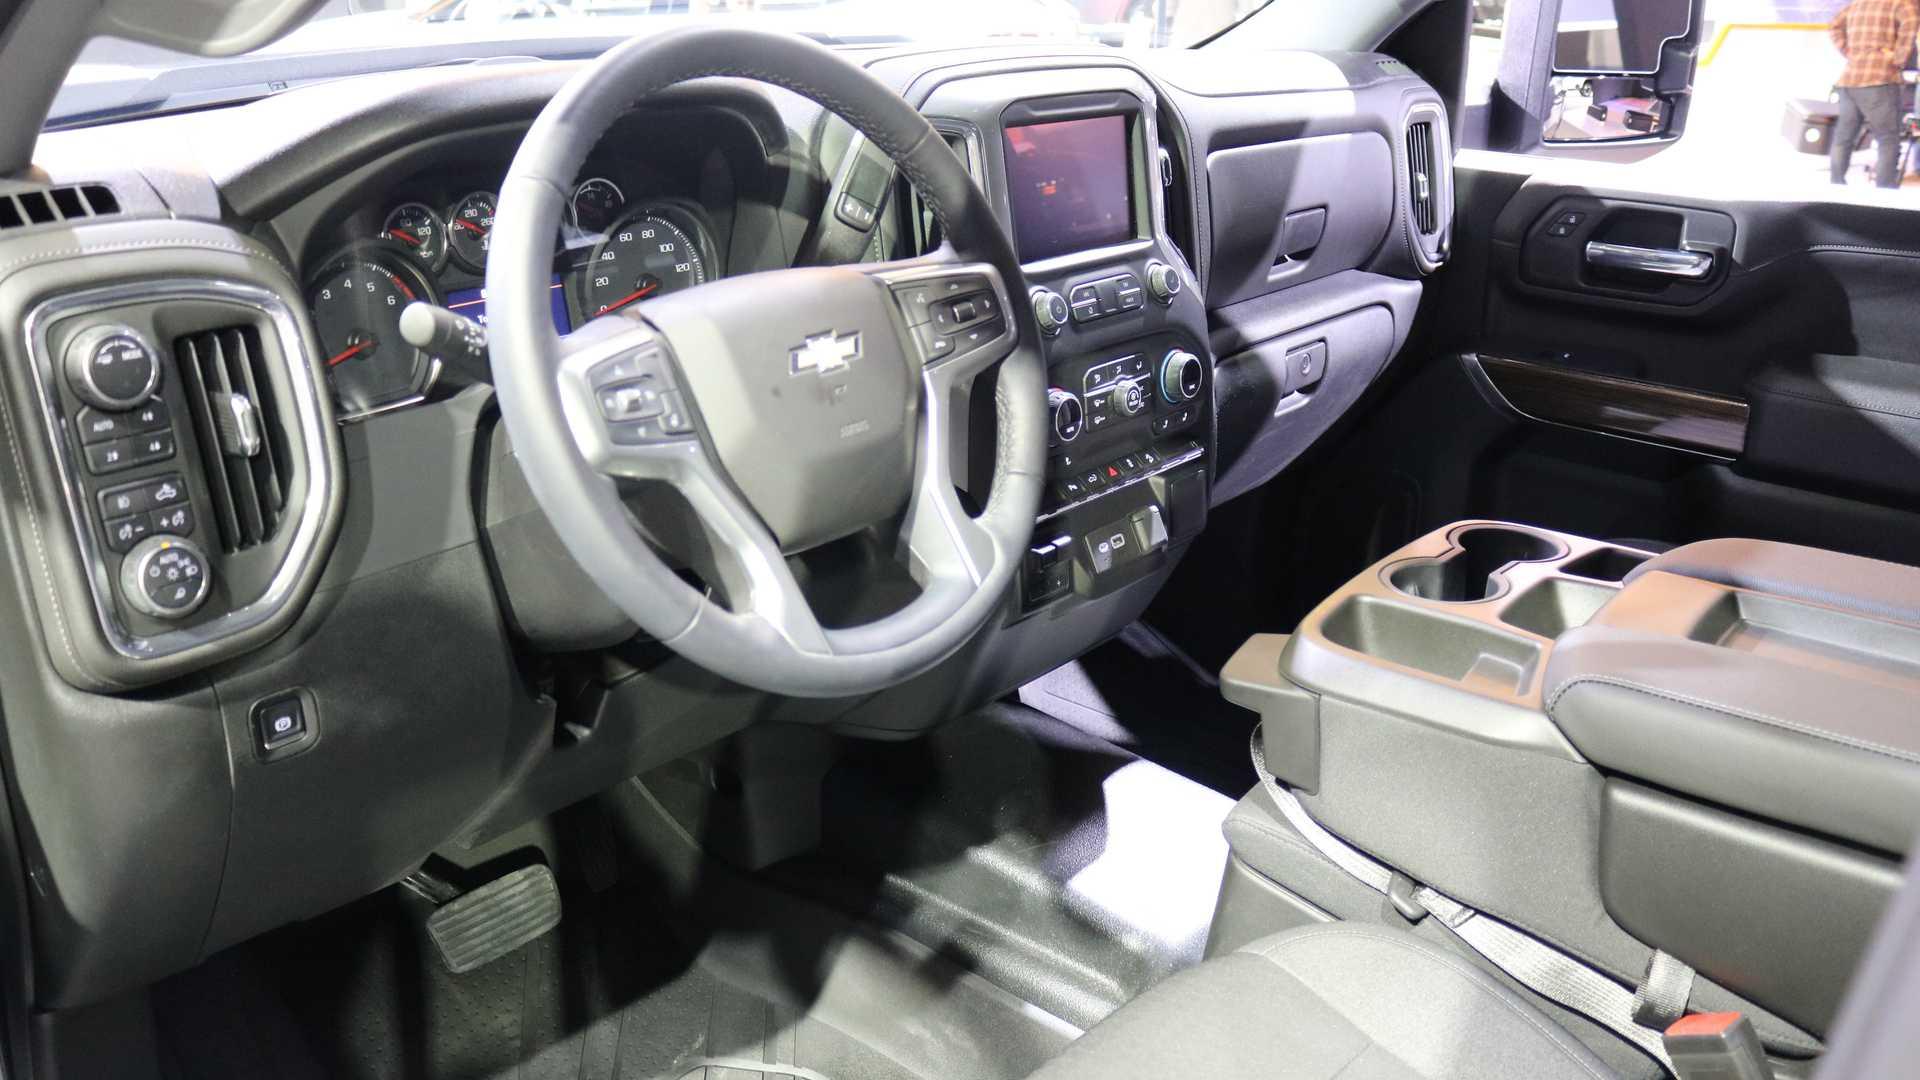 26 New 2020 Chevrolet Hd Interior Interior by 2020 Chevrolet Hd Interior